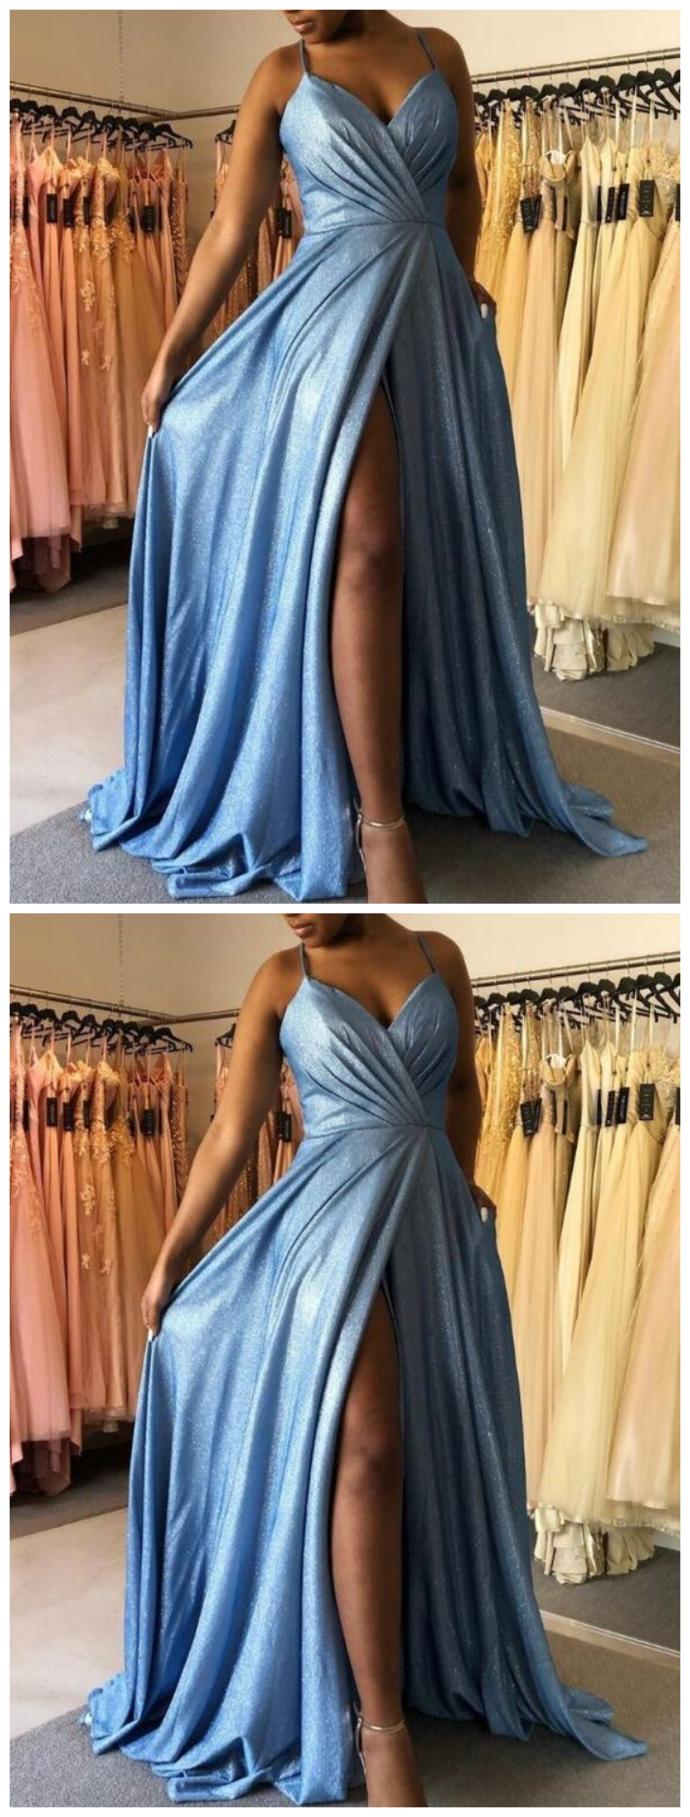 Sparkly Long Prom Dress , School Dance Dresses ,Fashion Winter Formal Dress